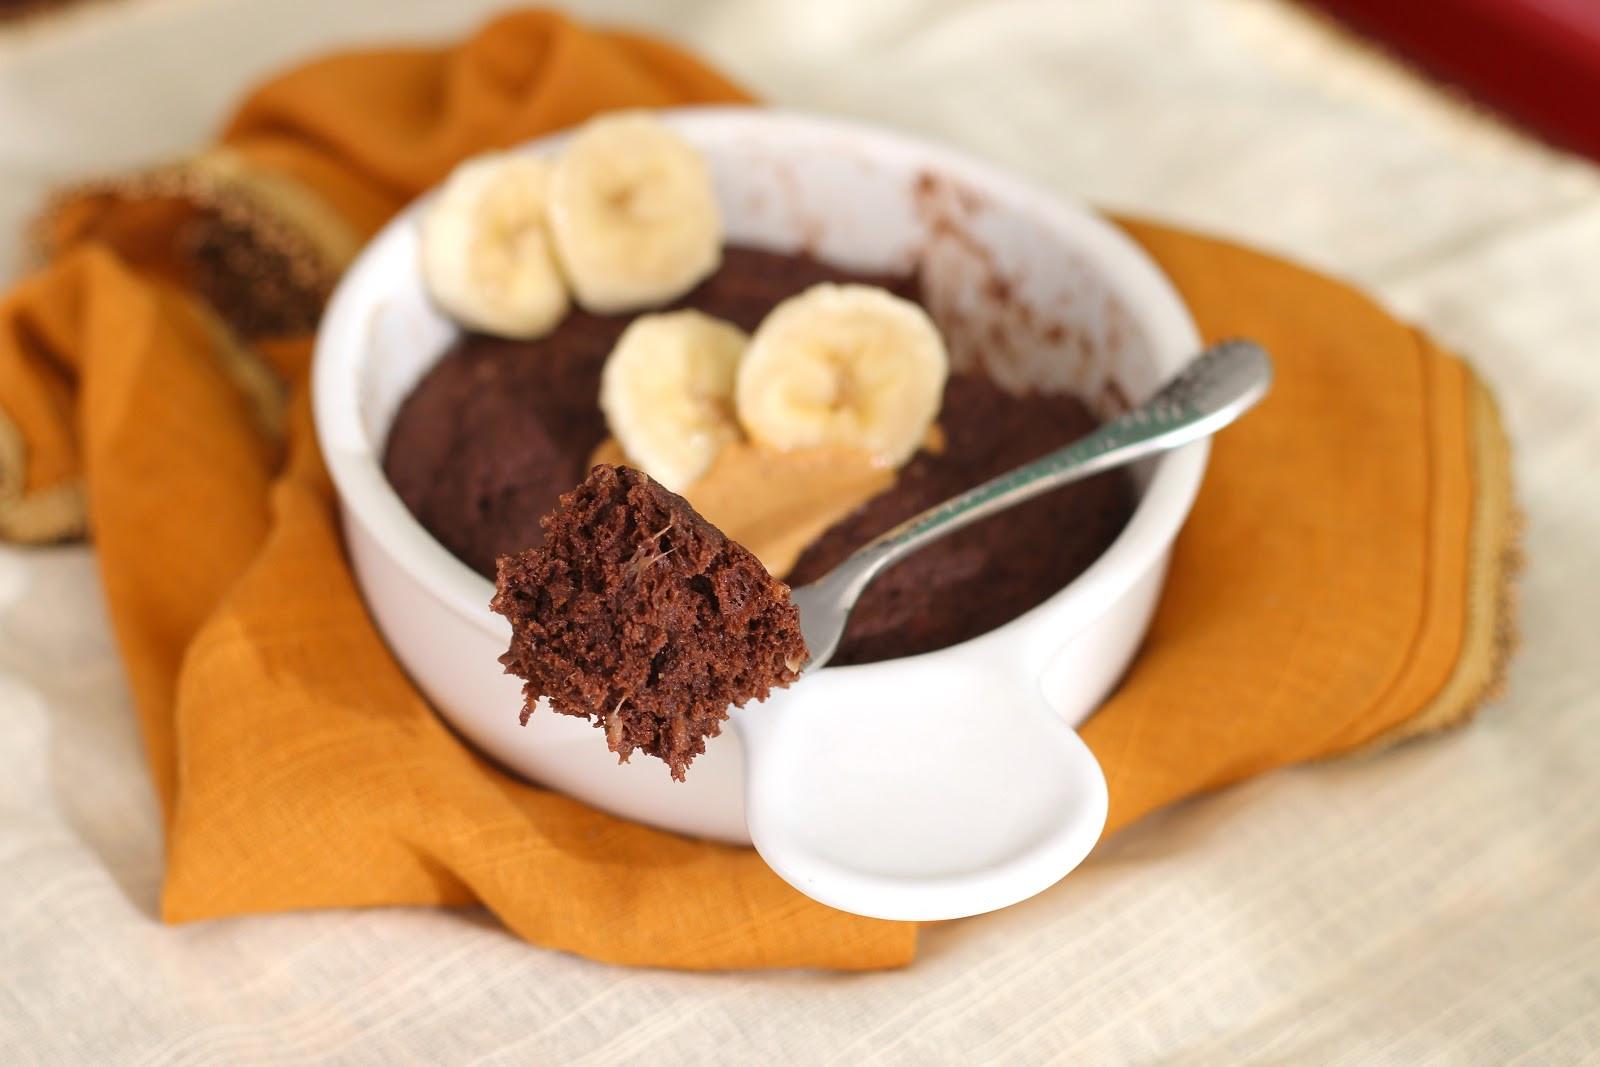 Healthy Banana Desserts Easy  Healthy Single Serving Chocolate Peanut Butter Banana